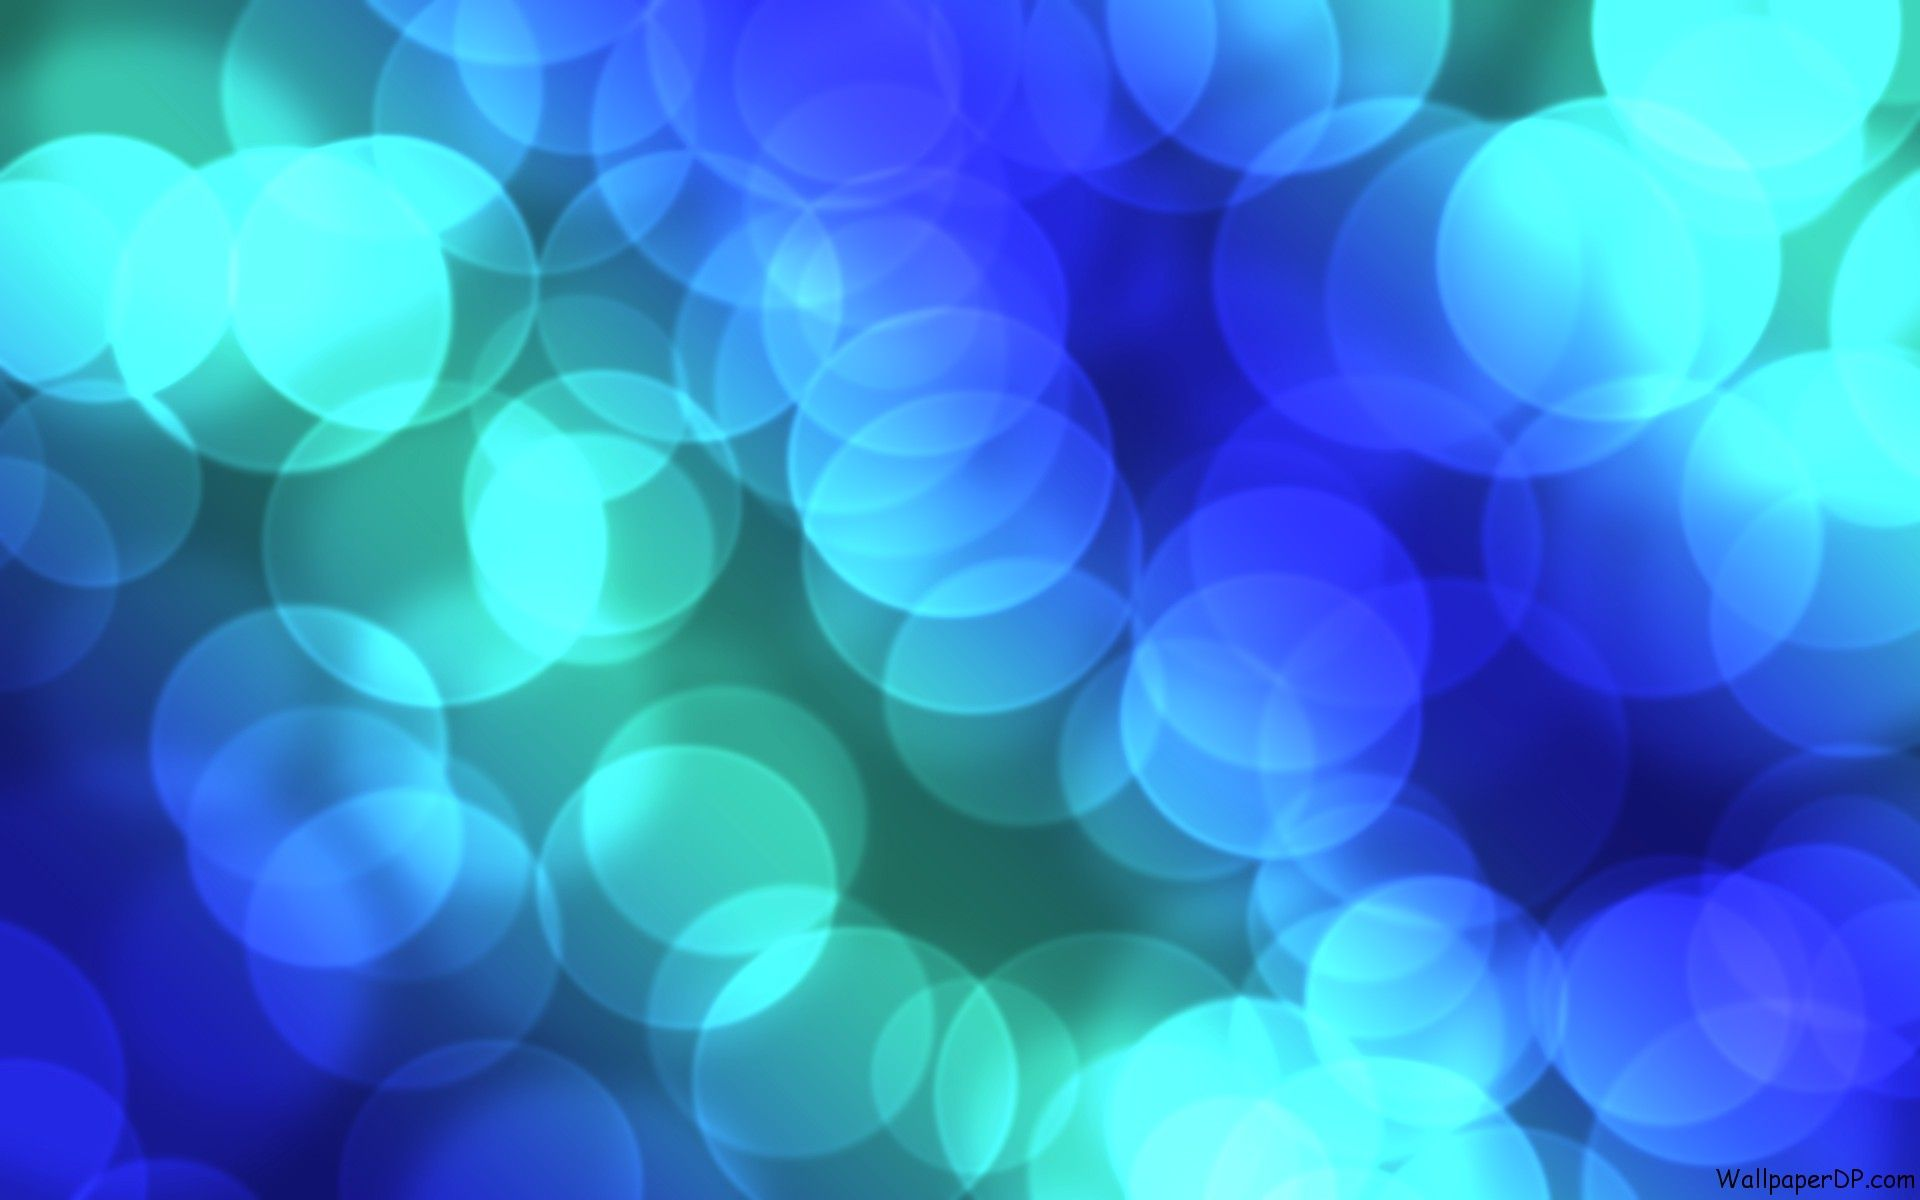 Image For Blue Light Blur Background Hd Image Download Free Arts